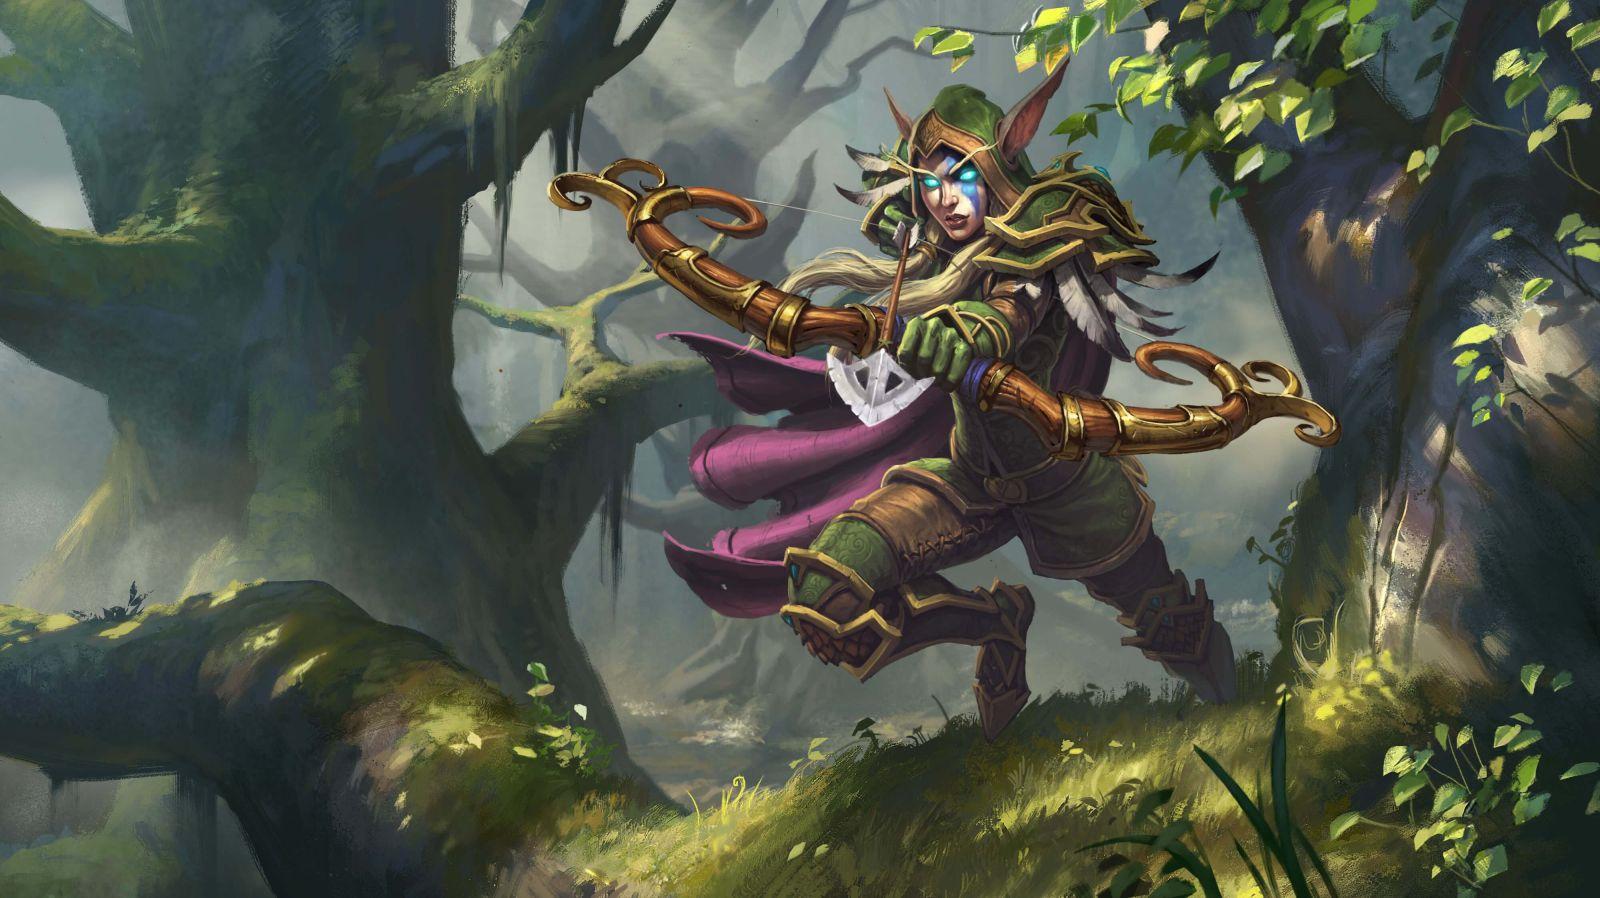 Alleria Windrunner (Hunter hős) és Medivh (Mage hős) (frissítve #2)